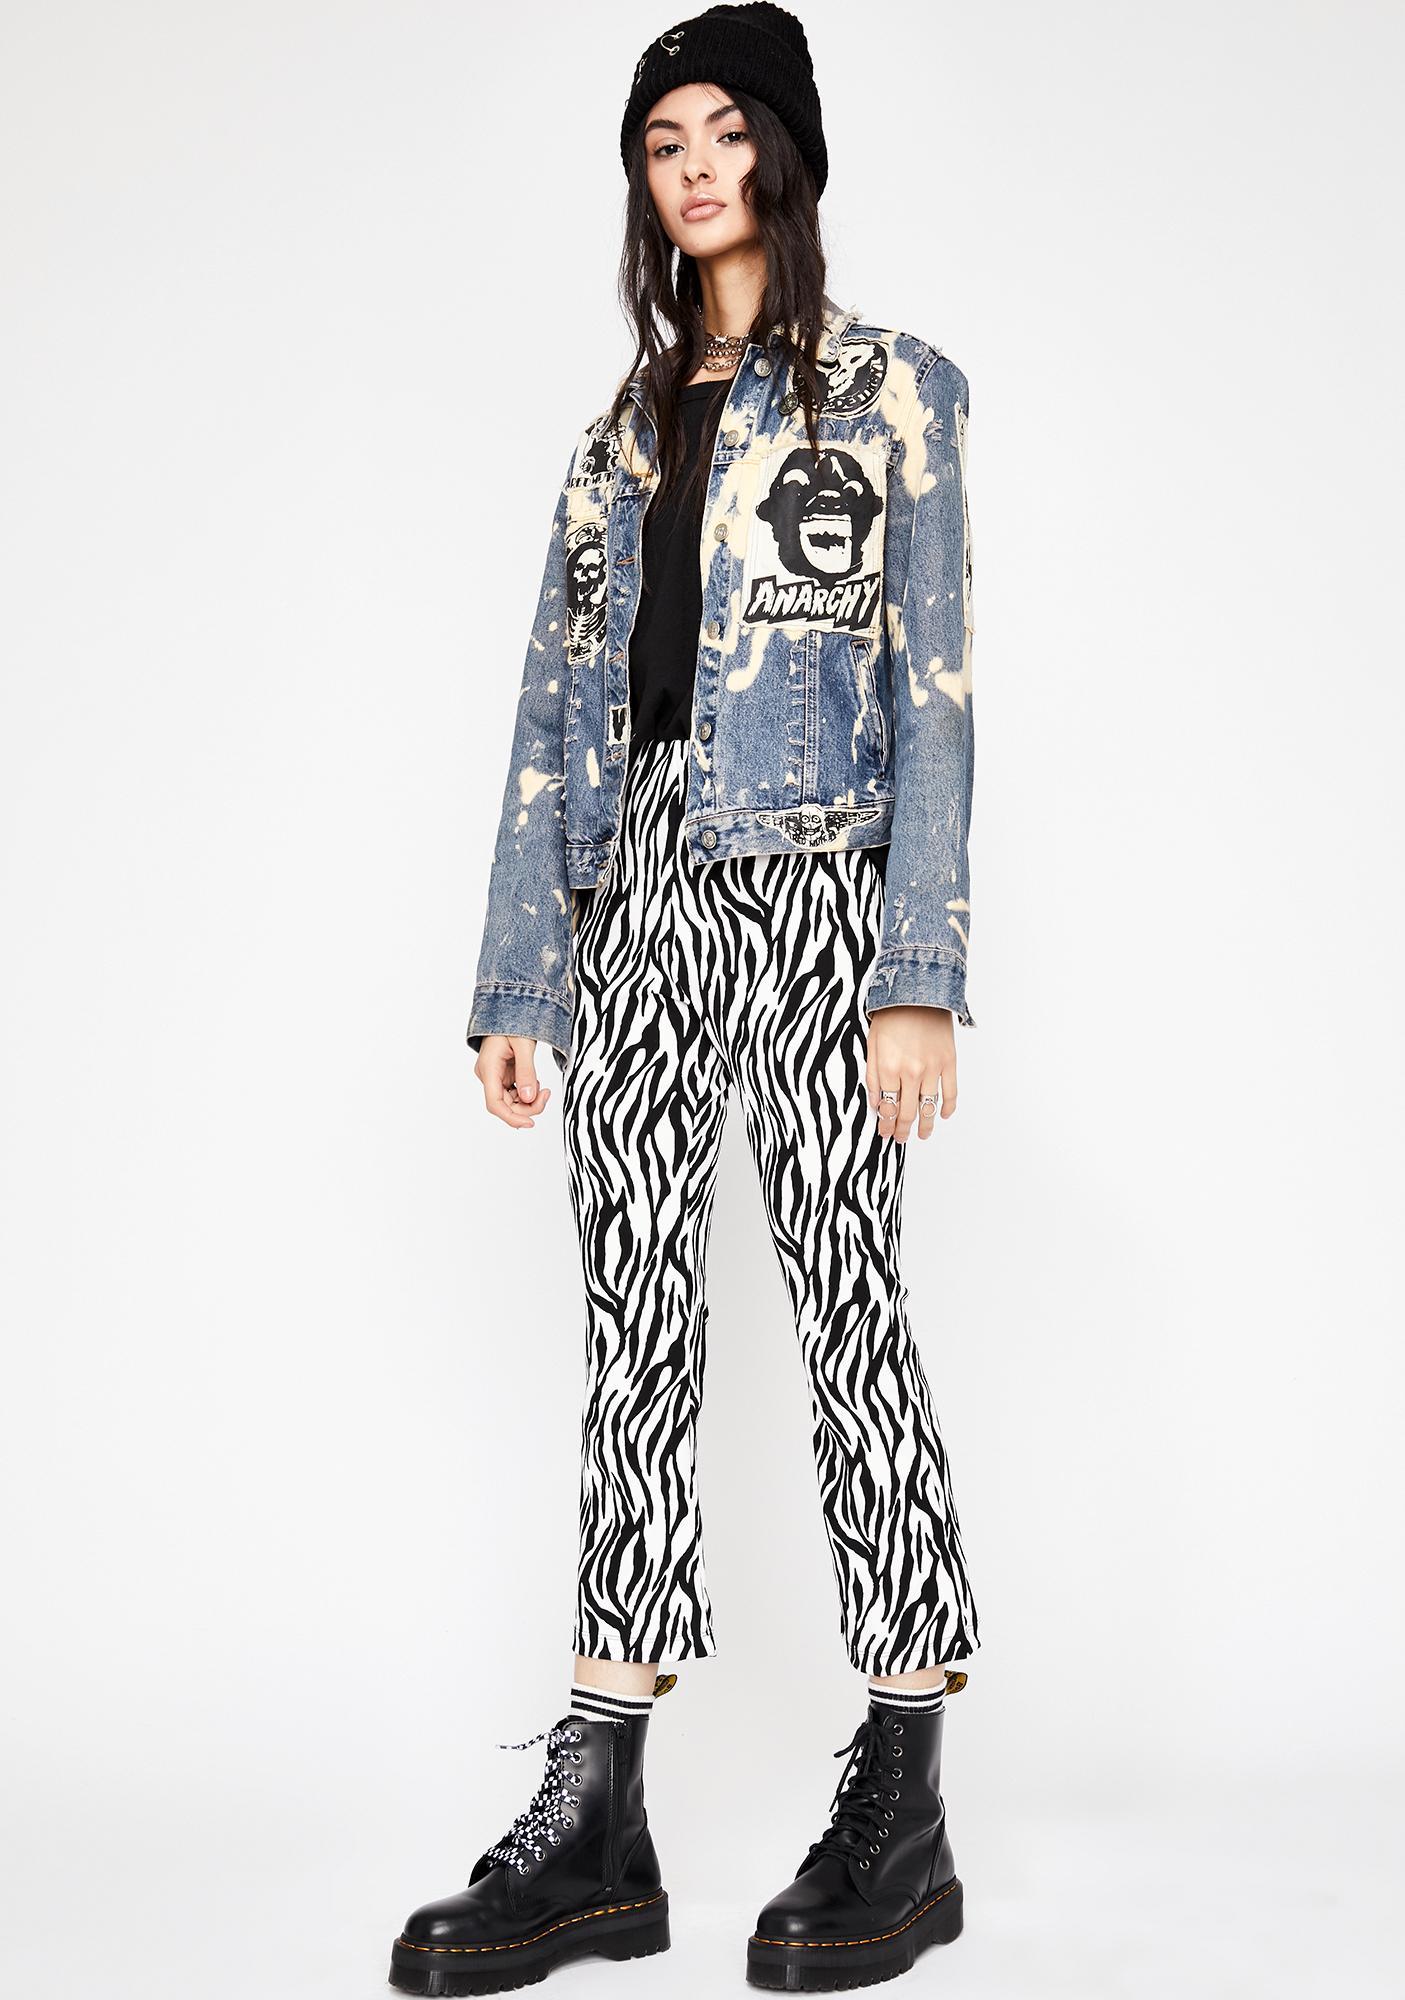 Wildest Ways Zebra Flares